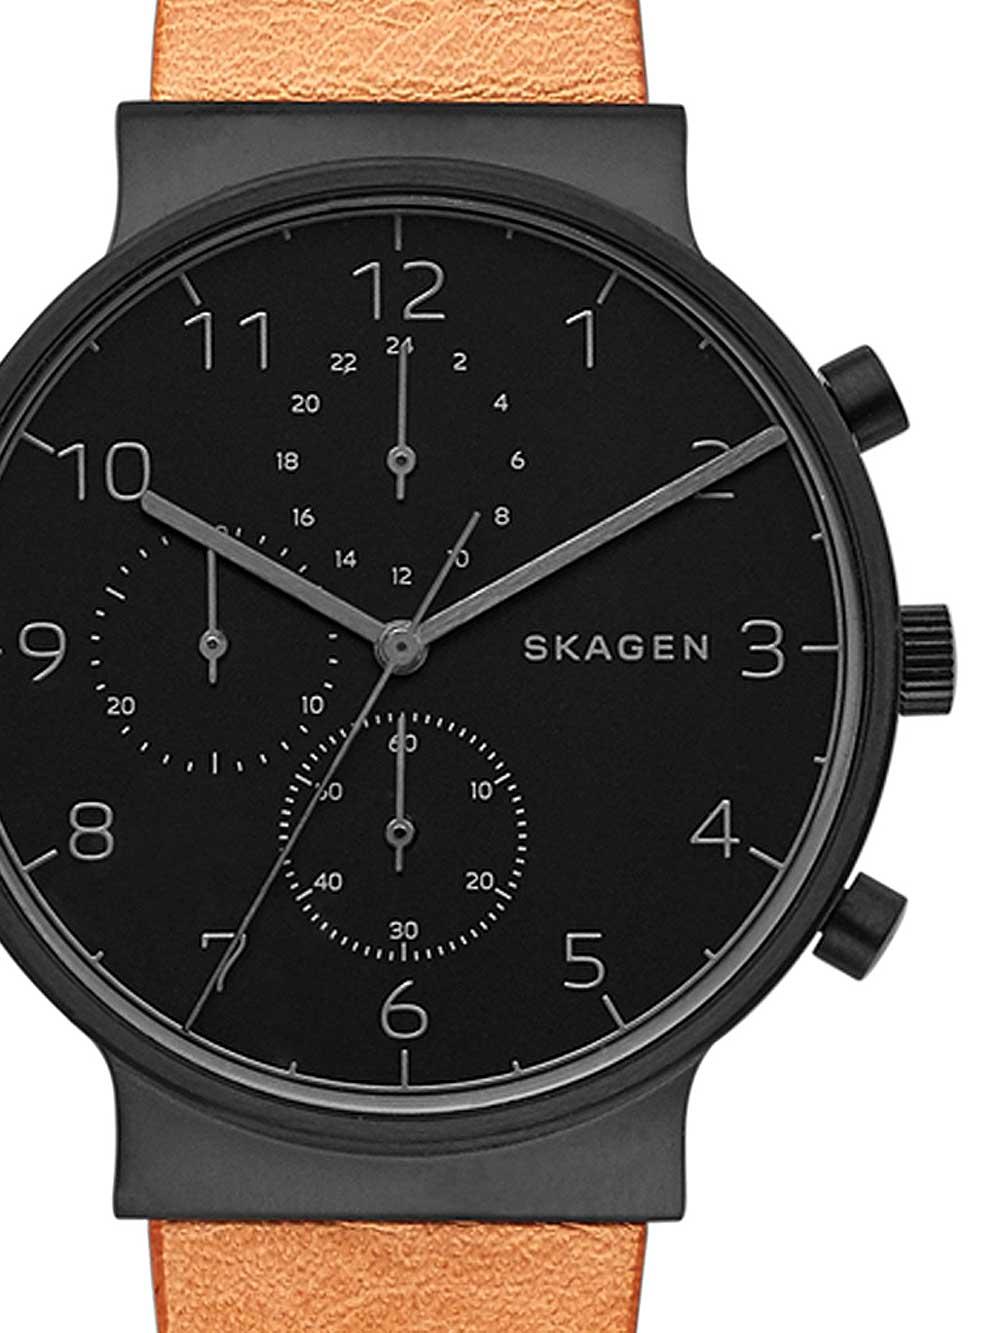 Skagen SKW6359 Chronograph 40mm 5ATM